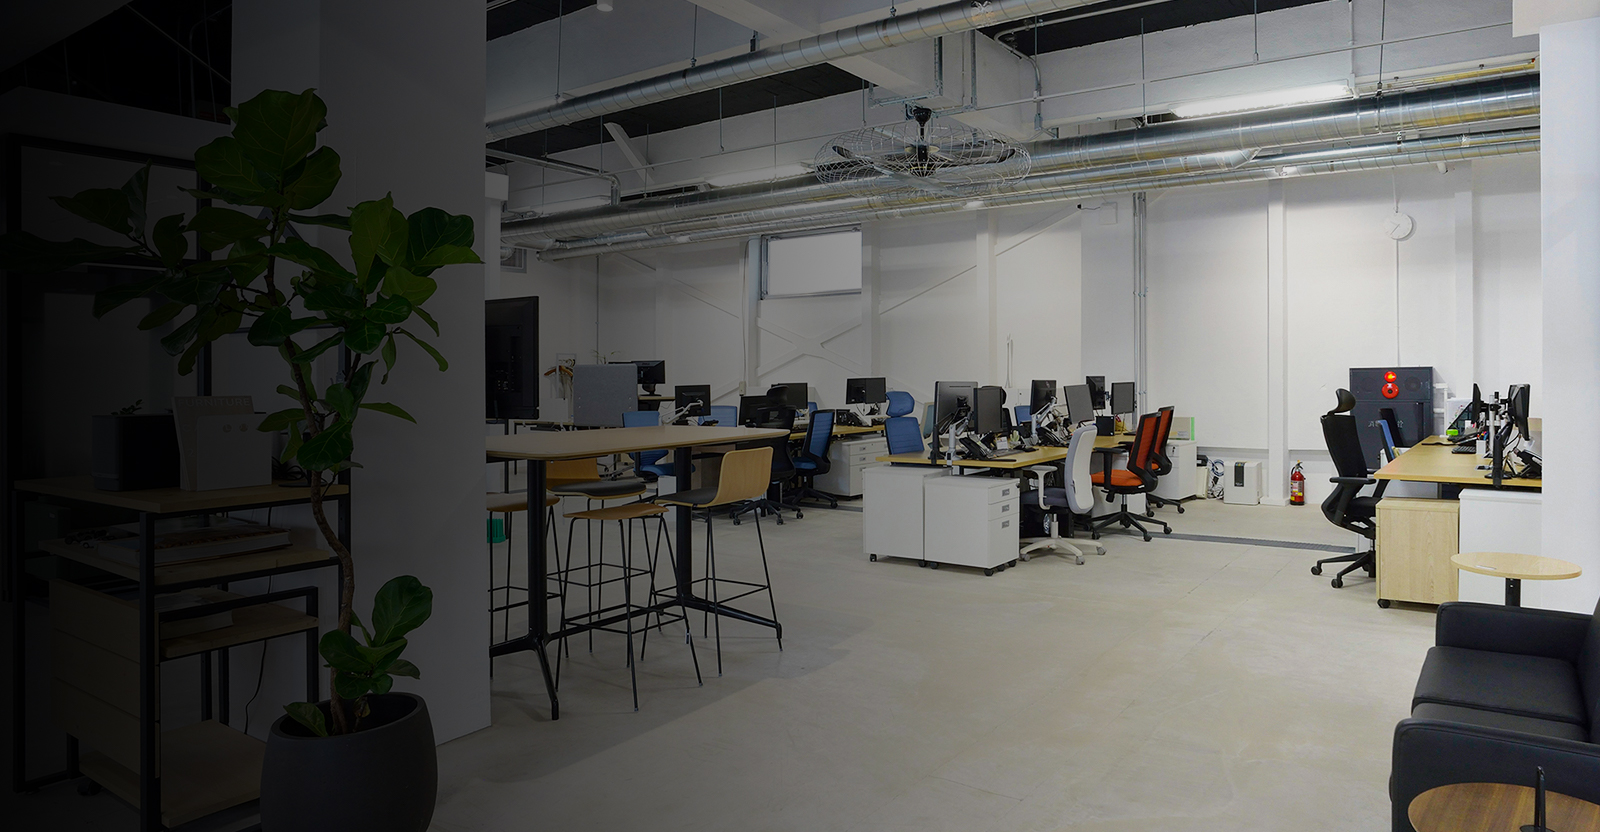 reinstatement contractor singapore